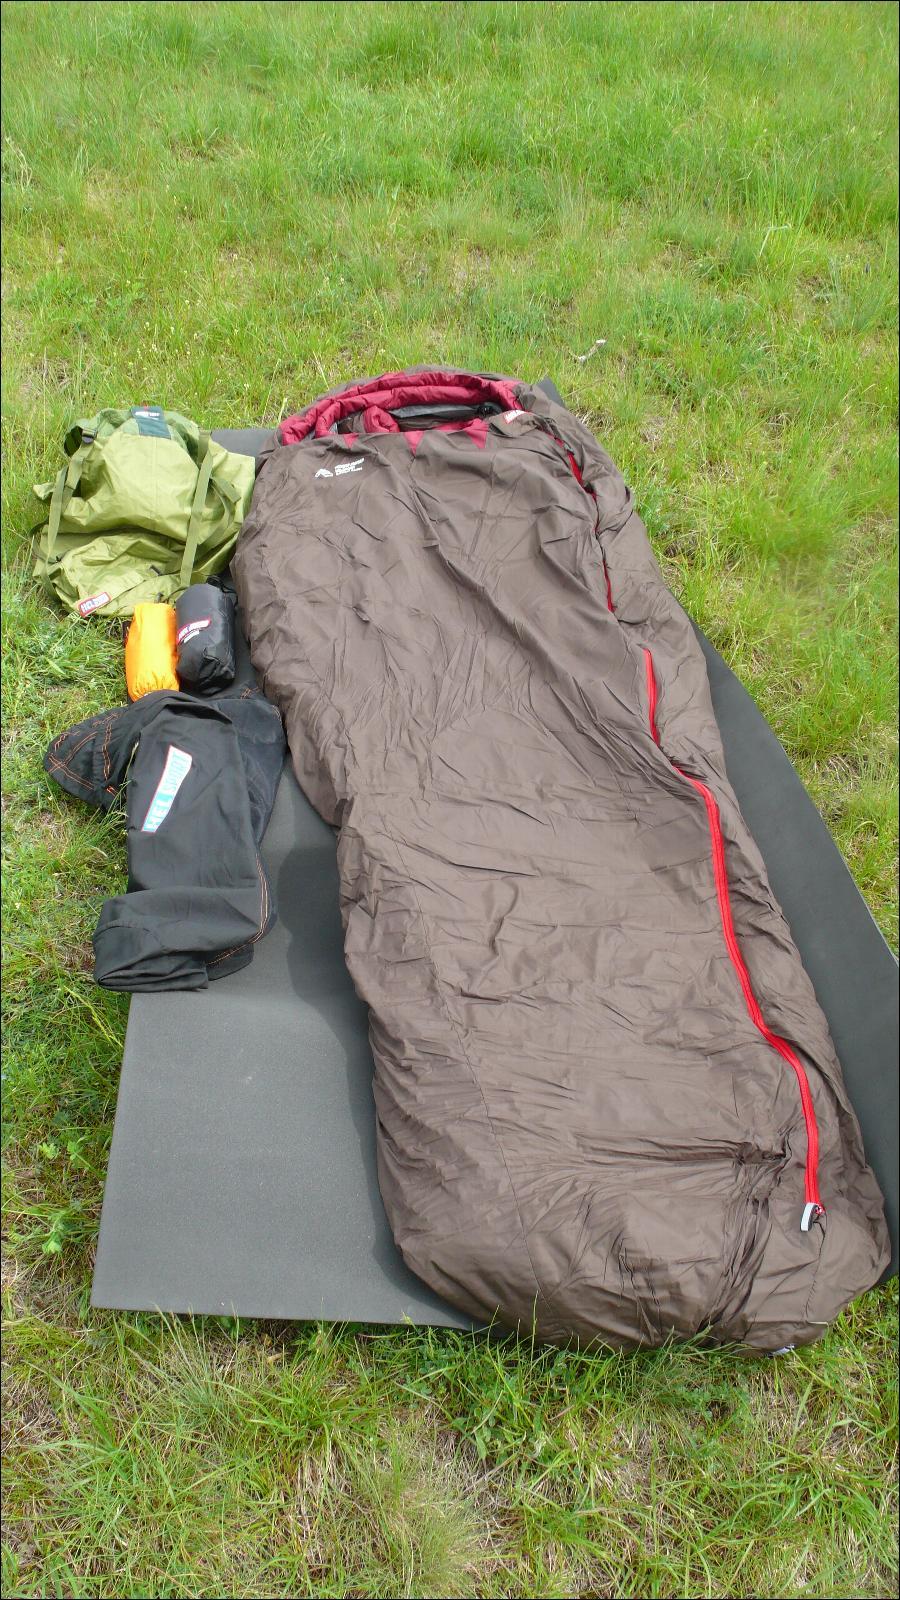 Sac couchage exp dition grand froid helsport kongsfjorden for Housse de compression sac de couchage